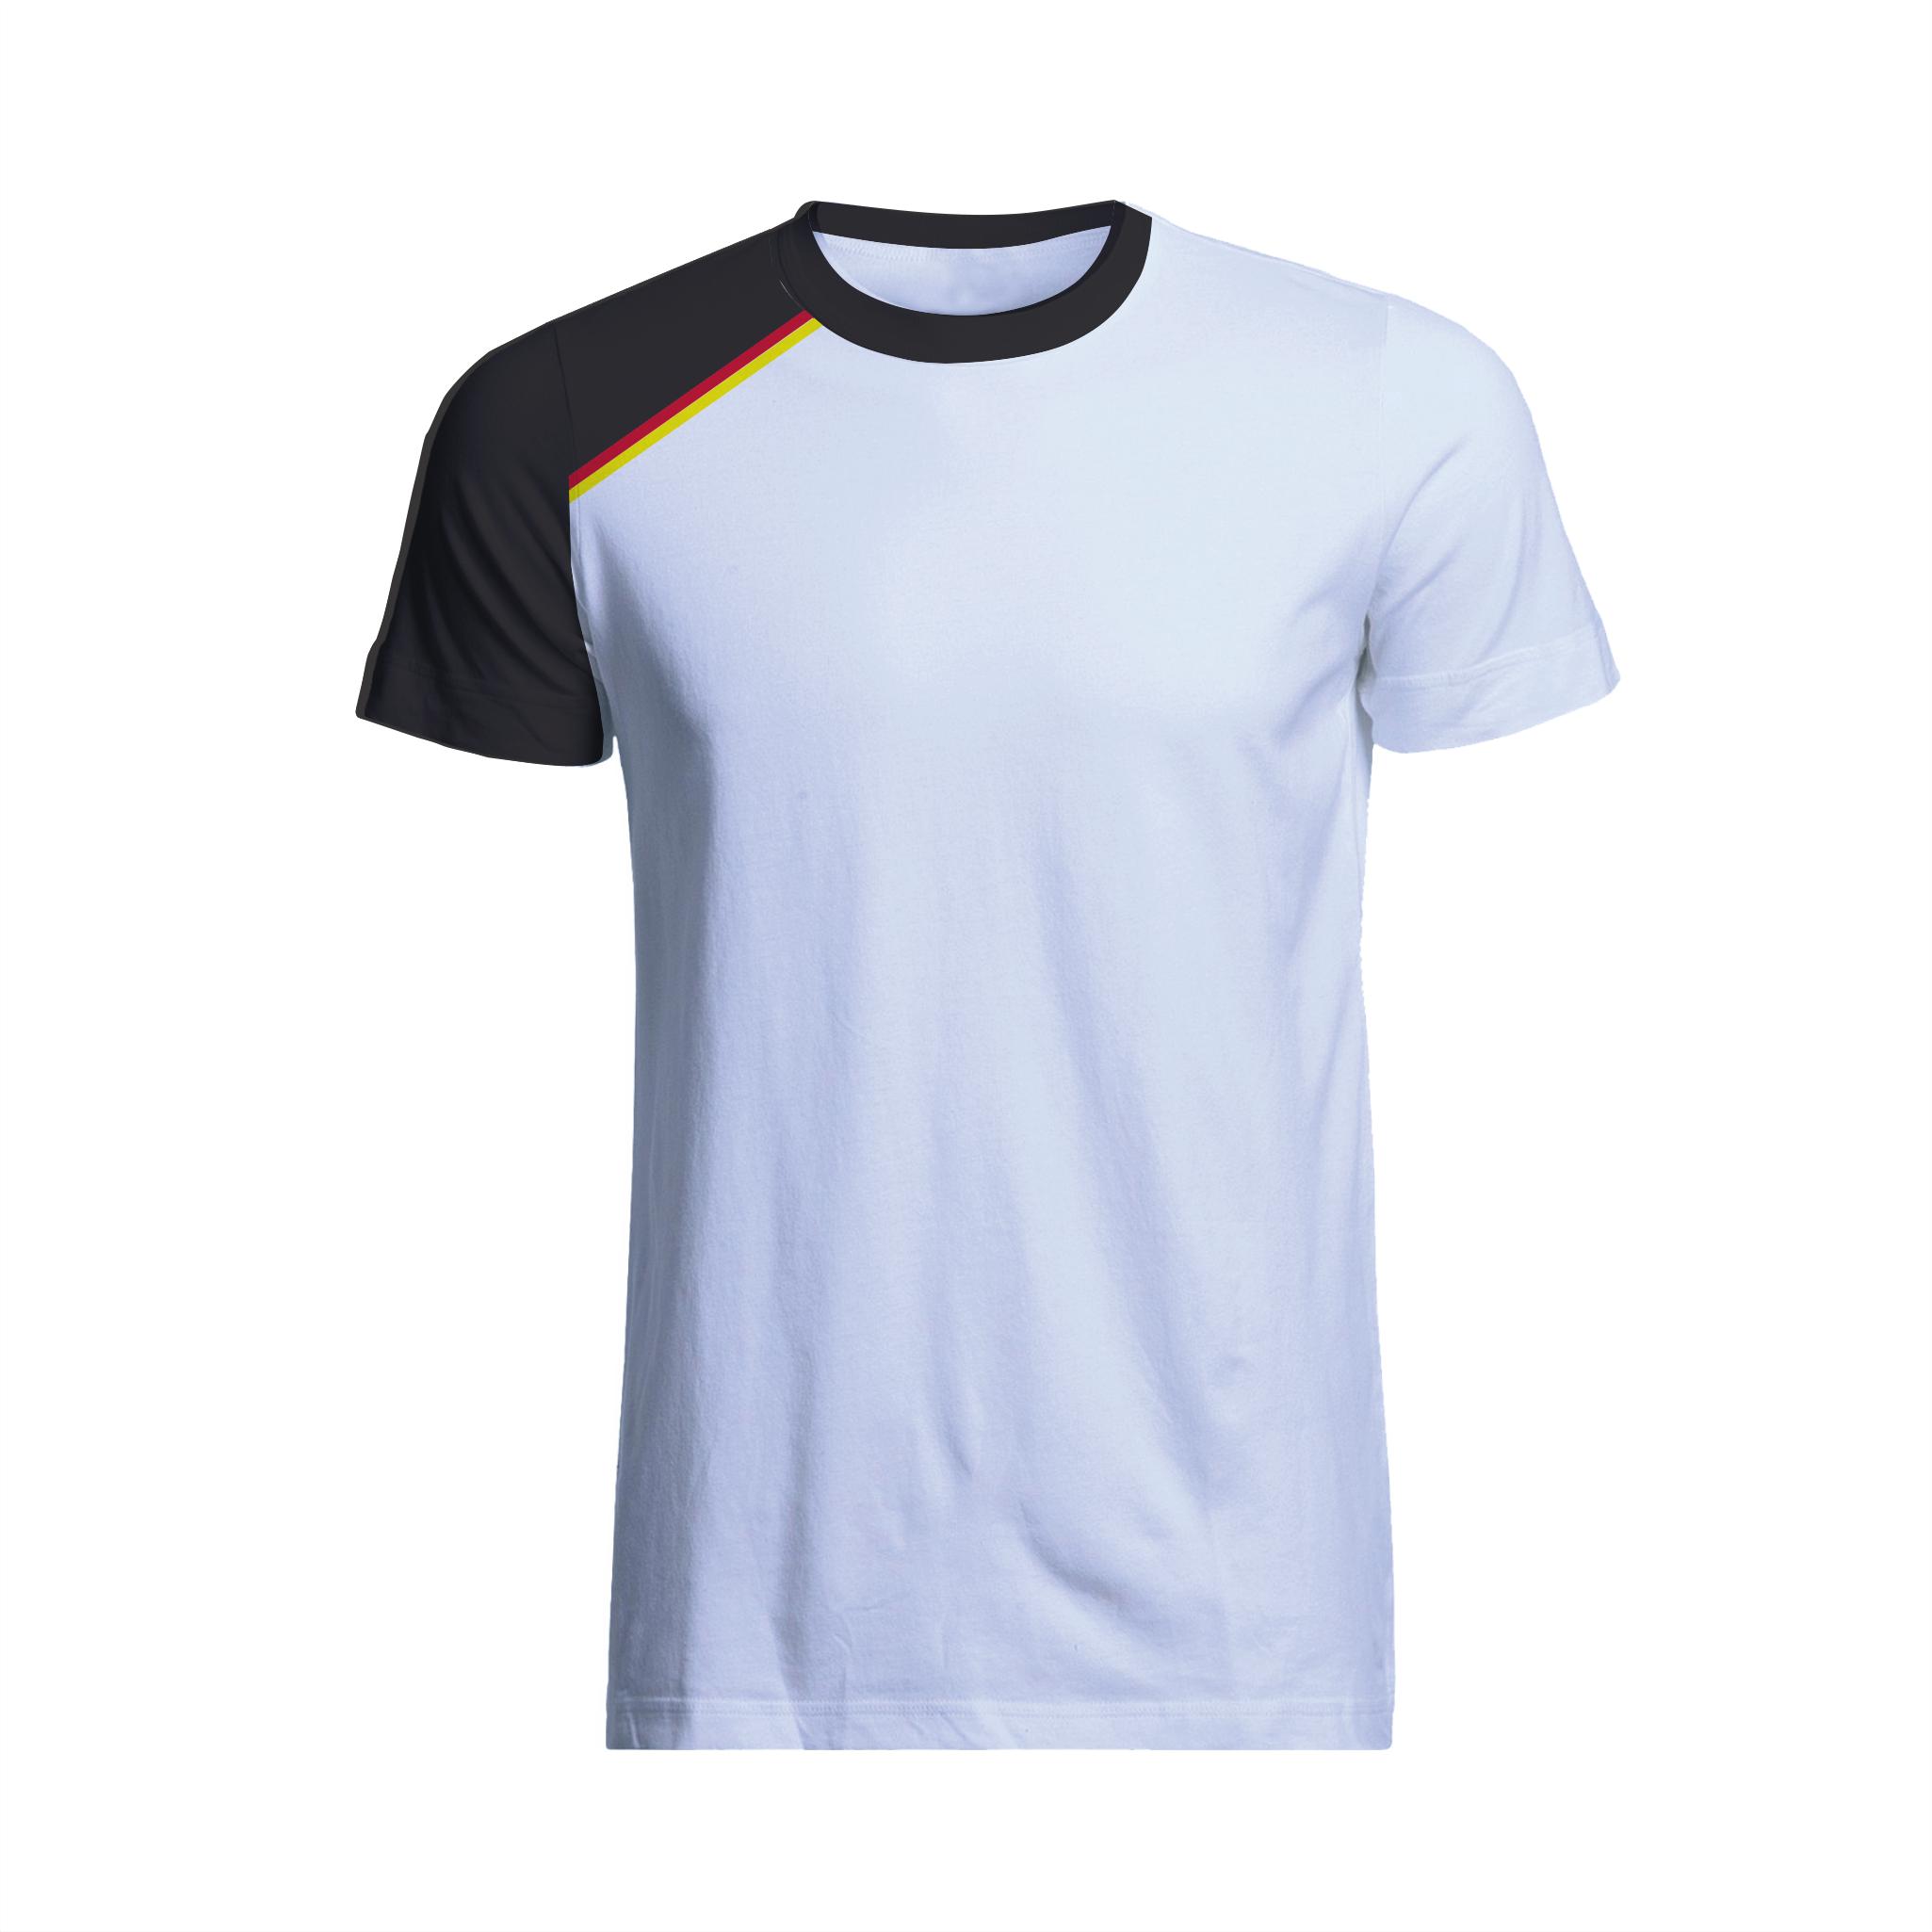 Panelled - Zuco football Shirt - Menzi